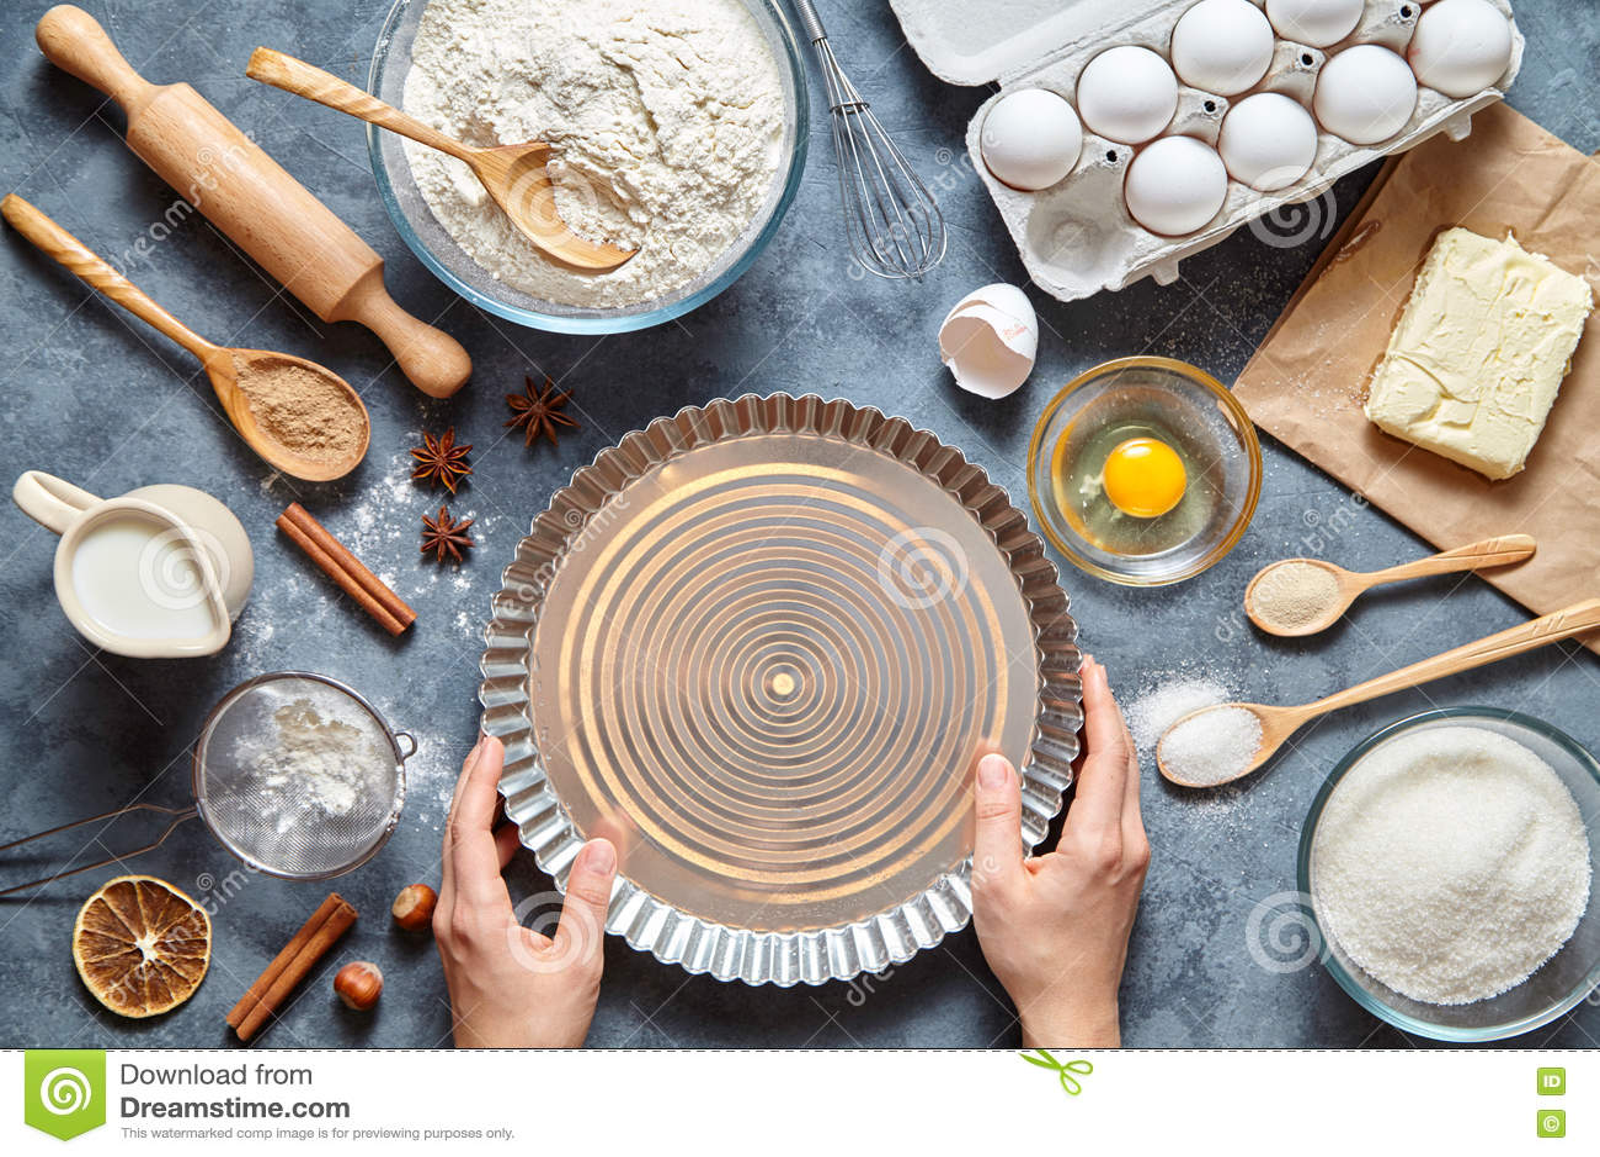 Making Dumplings With Cake Flour